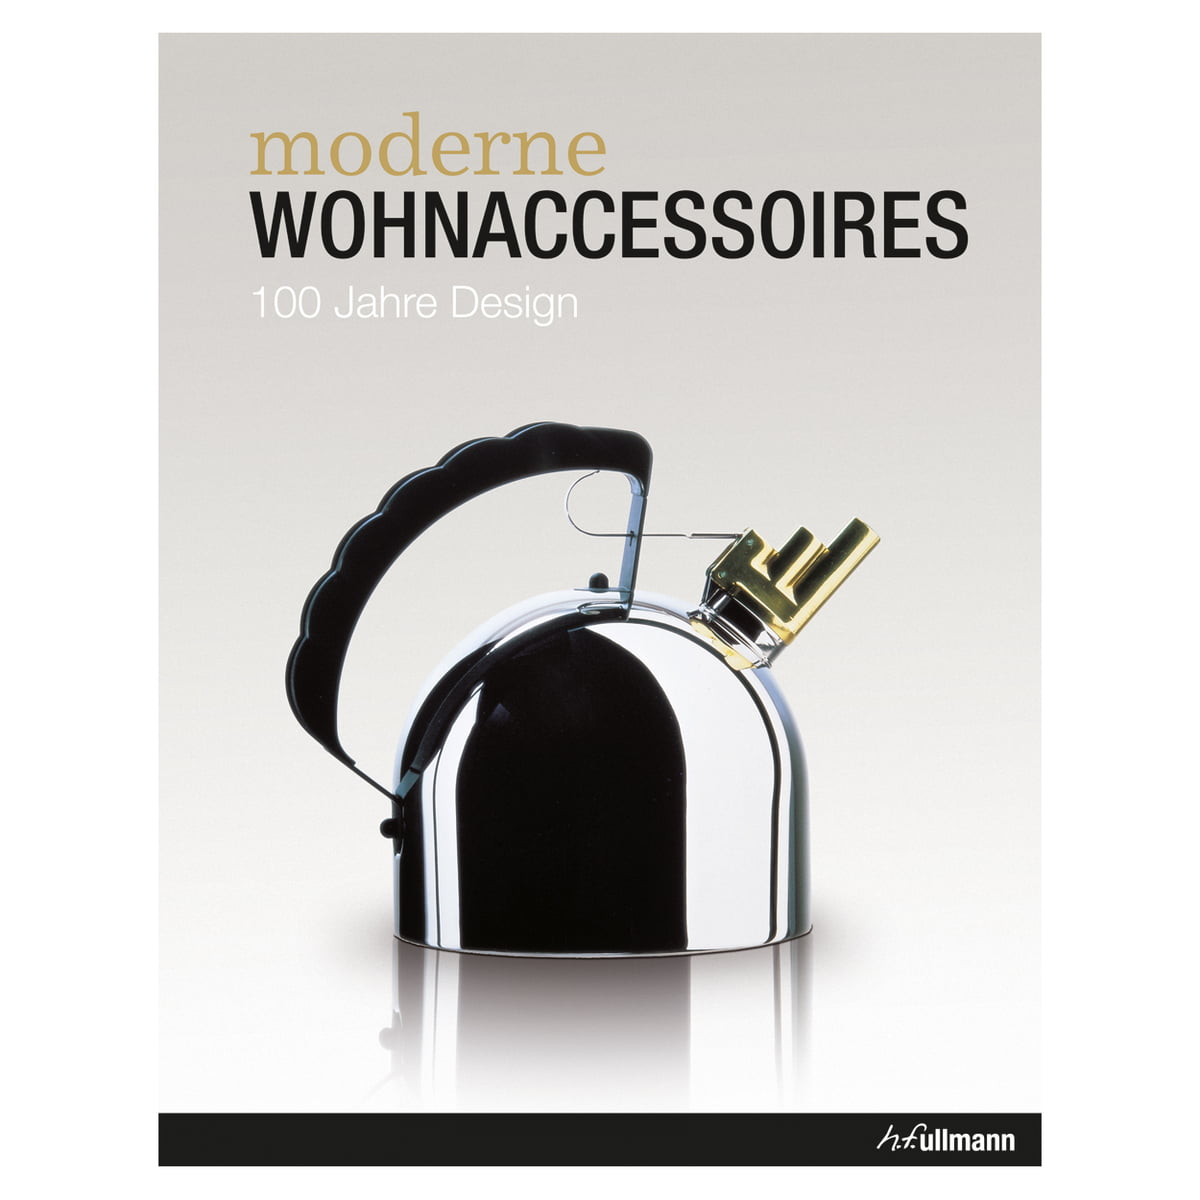 Moderne wohnaccessoires h f ullmann shop for Wohnaccessoires shop